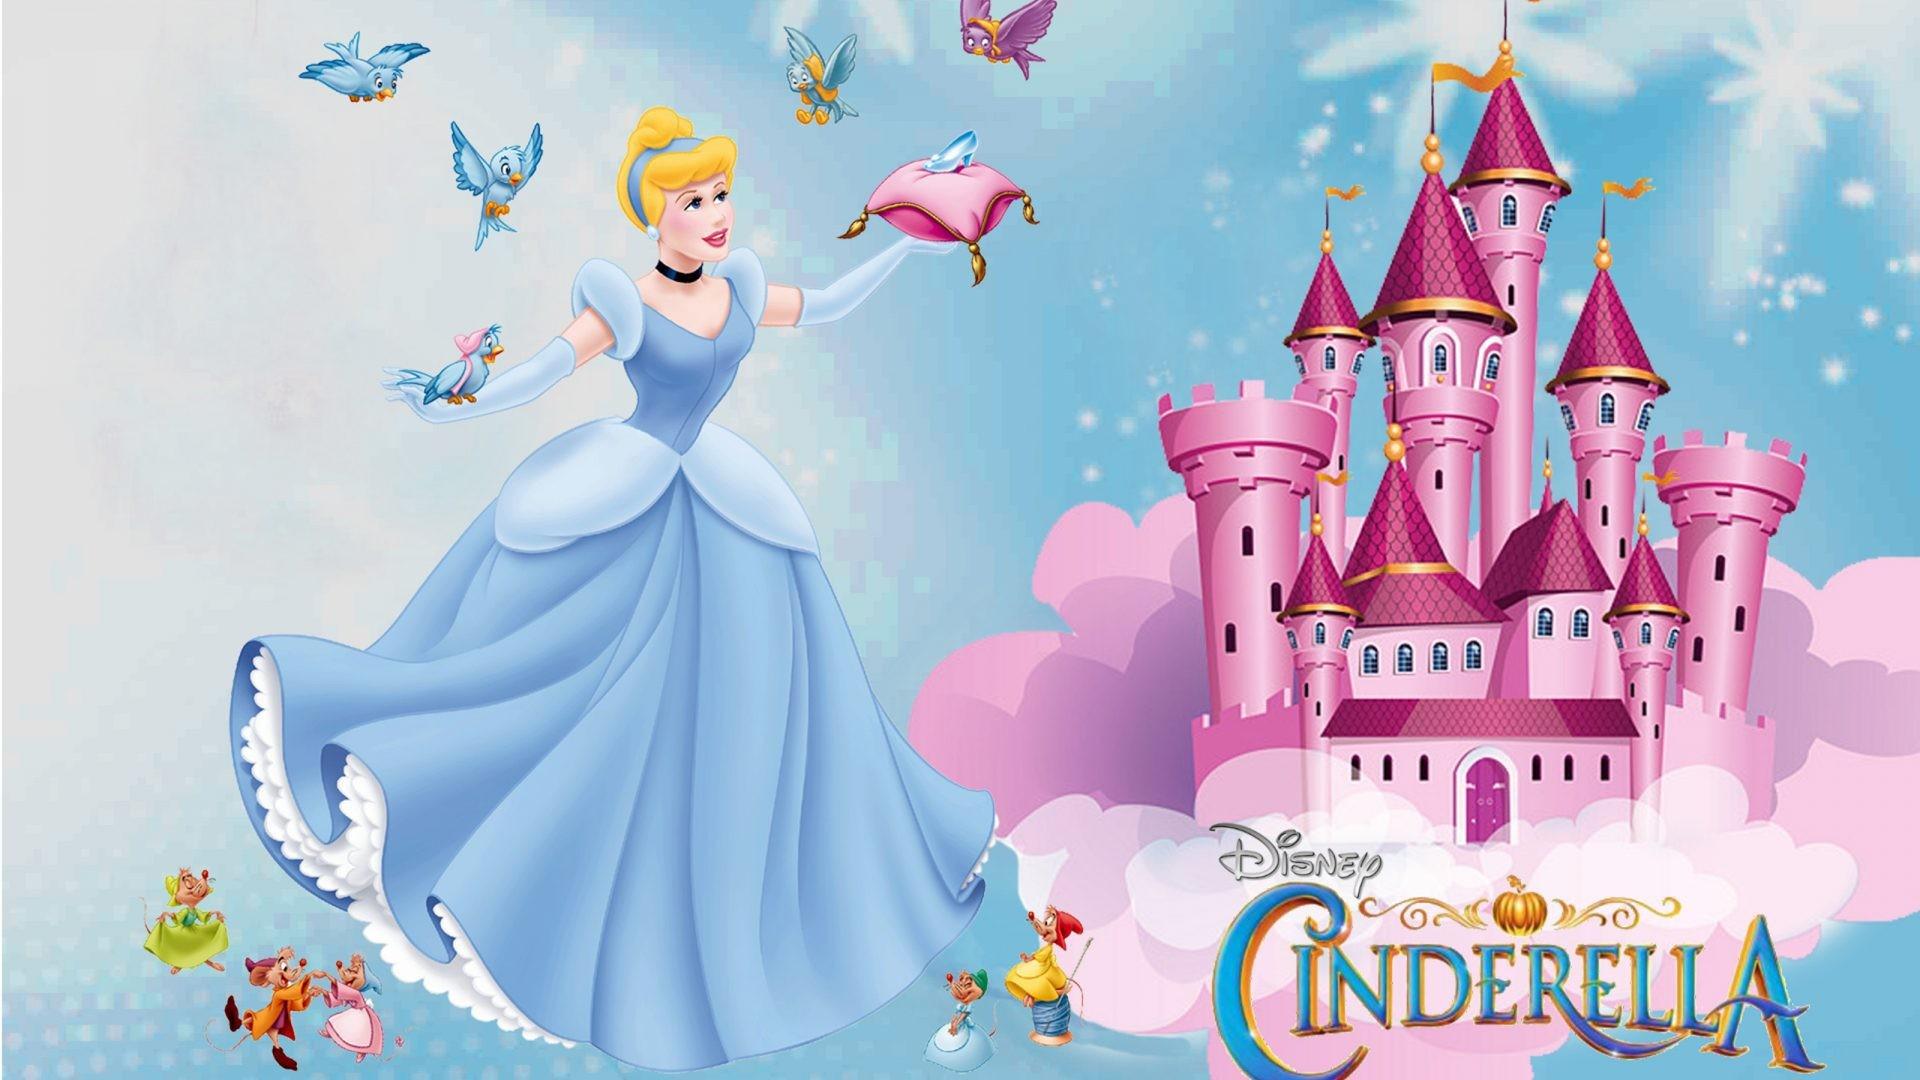 Cinderella Wallpaper 69 Pictures